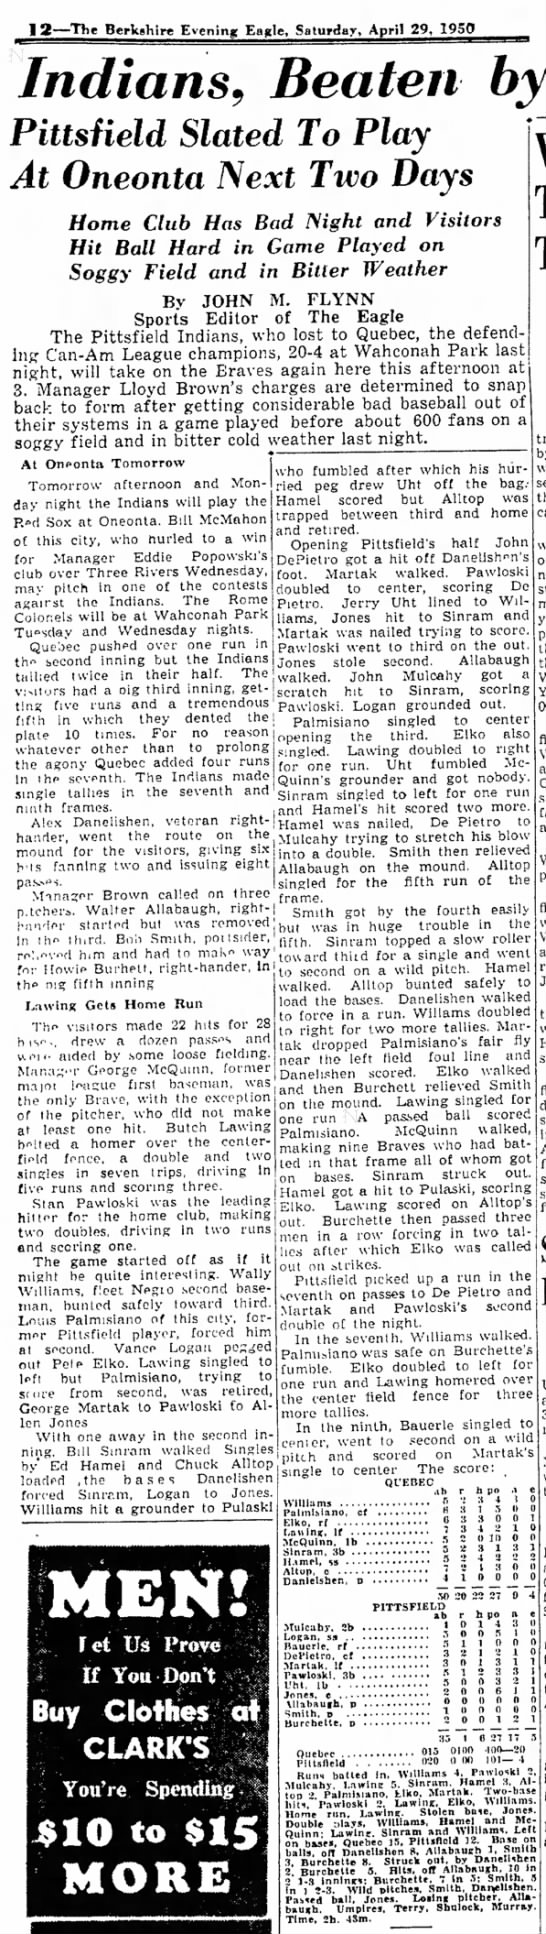 19500429 The Berkshire Eagle (Pittsfield, Massachusetts) Saturday, April 29, 1950 p12 CLIP